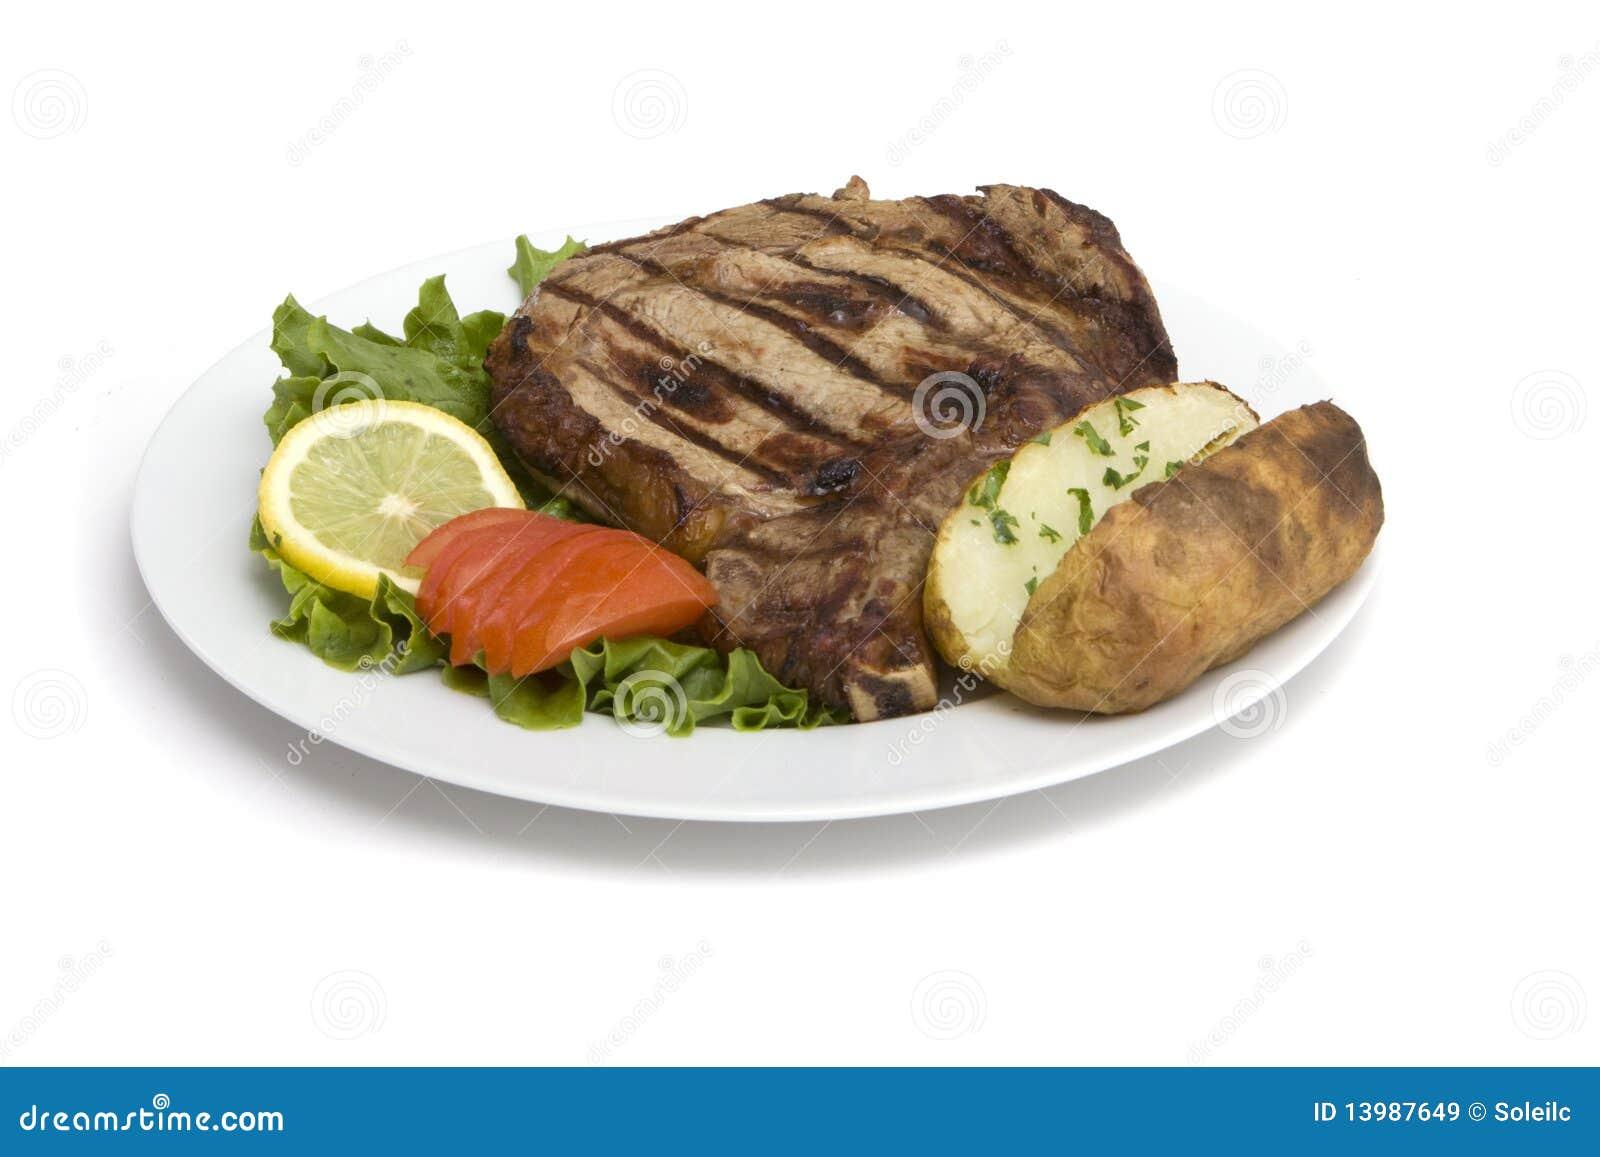 Steak Dinner Royalty Free Stock Images - Image: 13987649